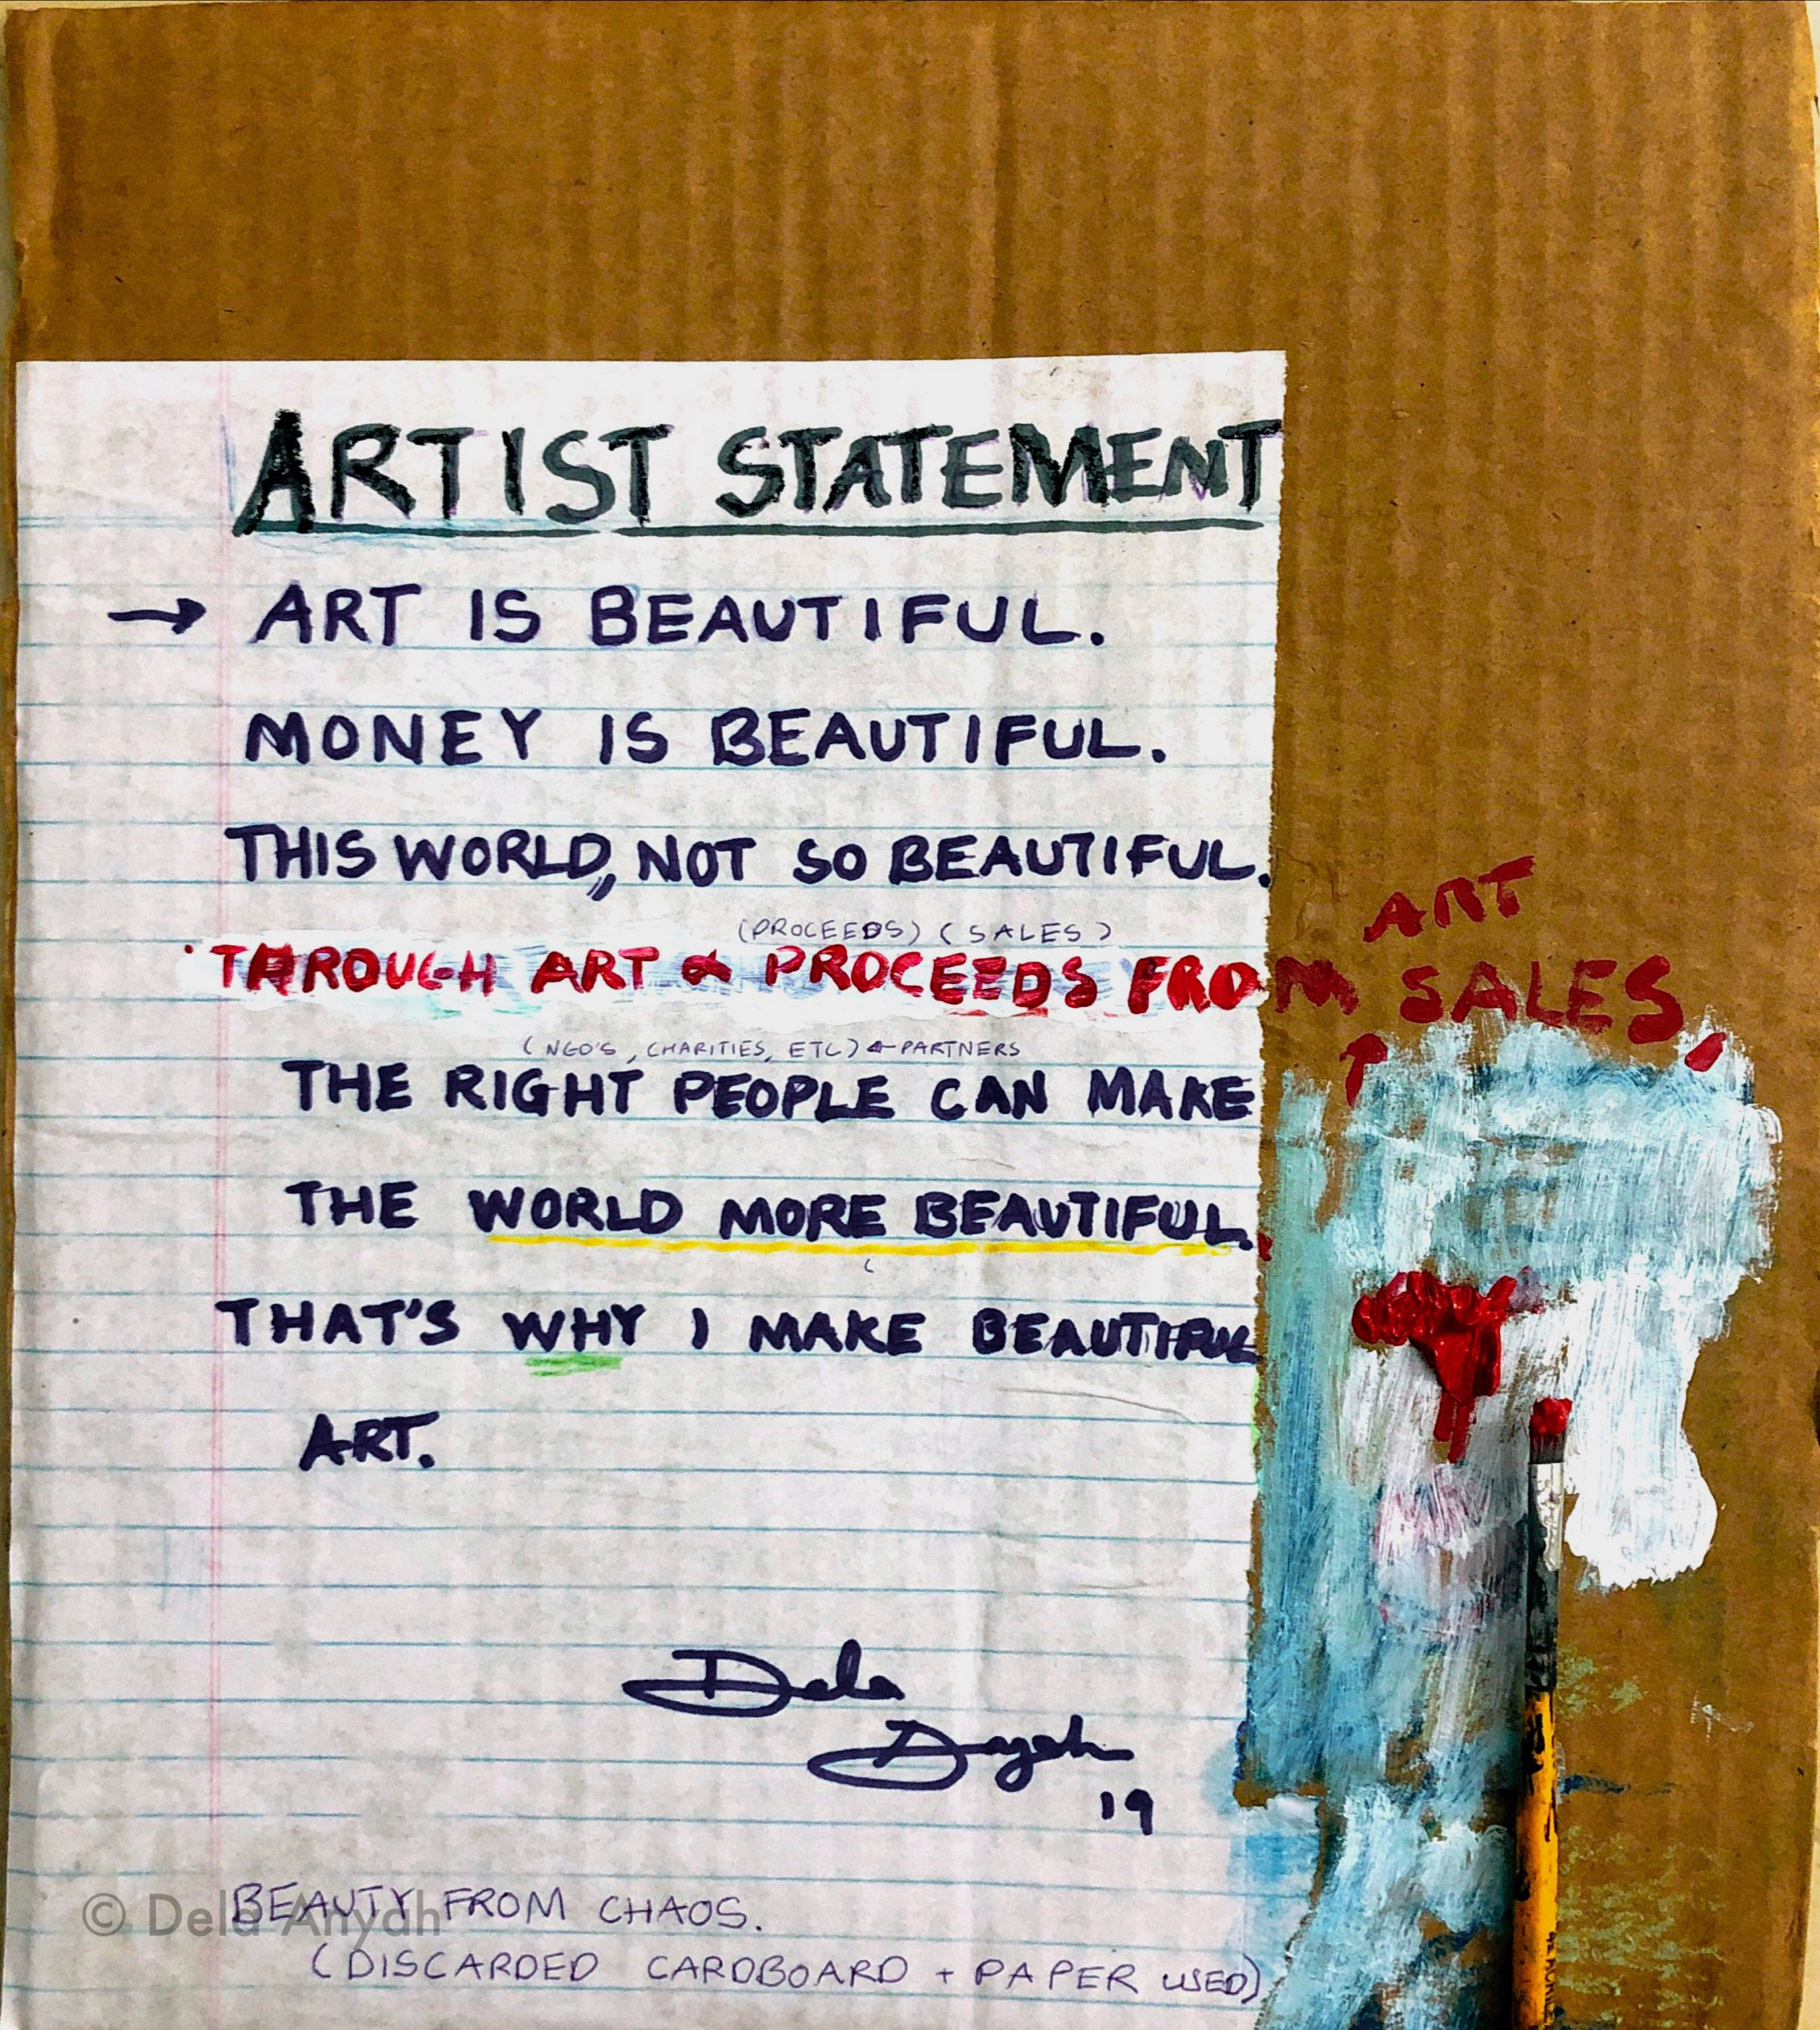 Dela Anyah's Artist Statement